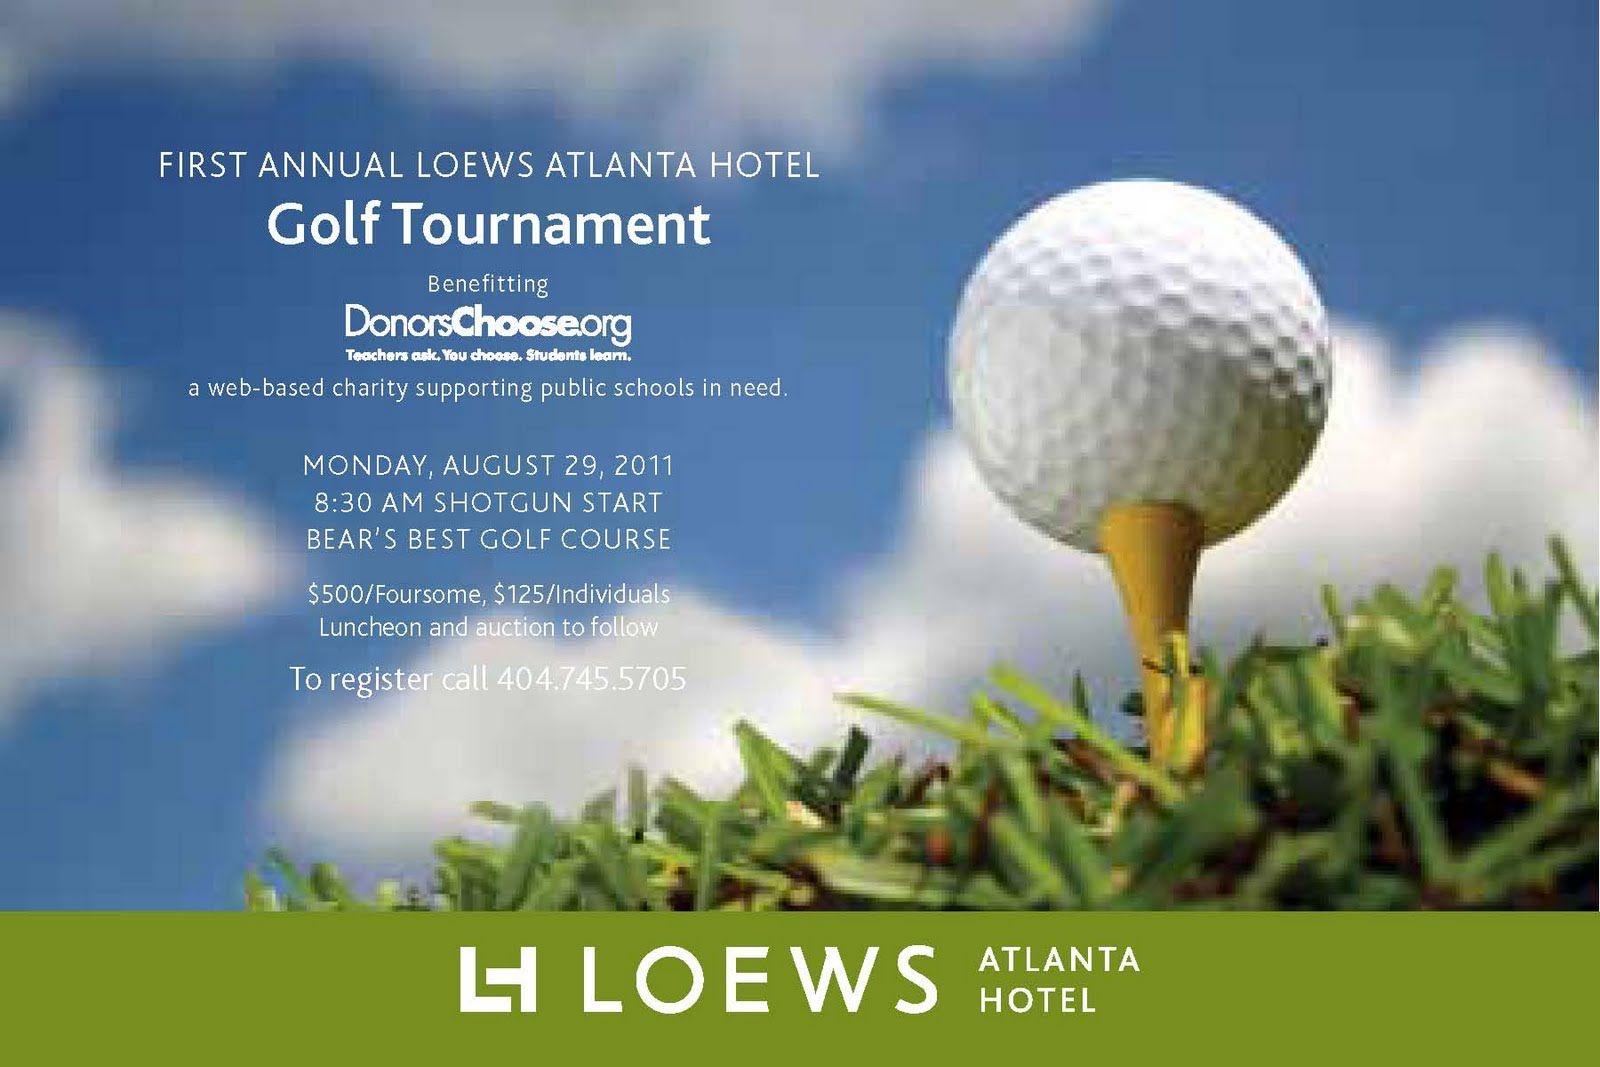 Golf Outing Flyer Invitation Template Golf Invitation Golf Tournament